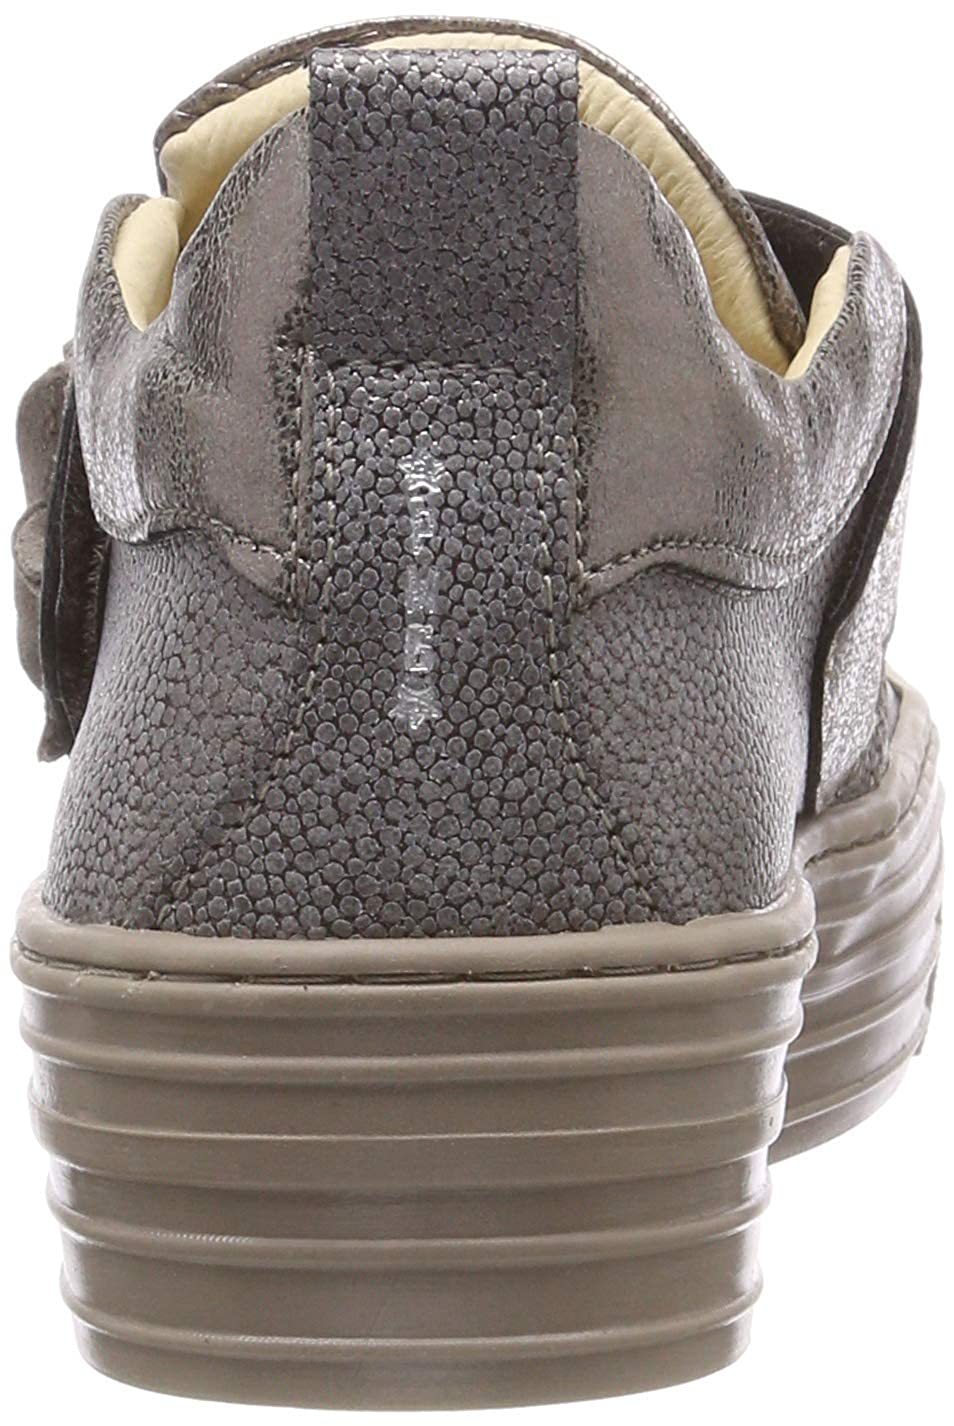 Primigi Psa 24337 Sneakers Basses Fille